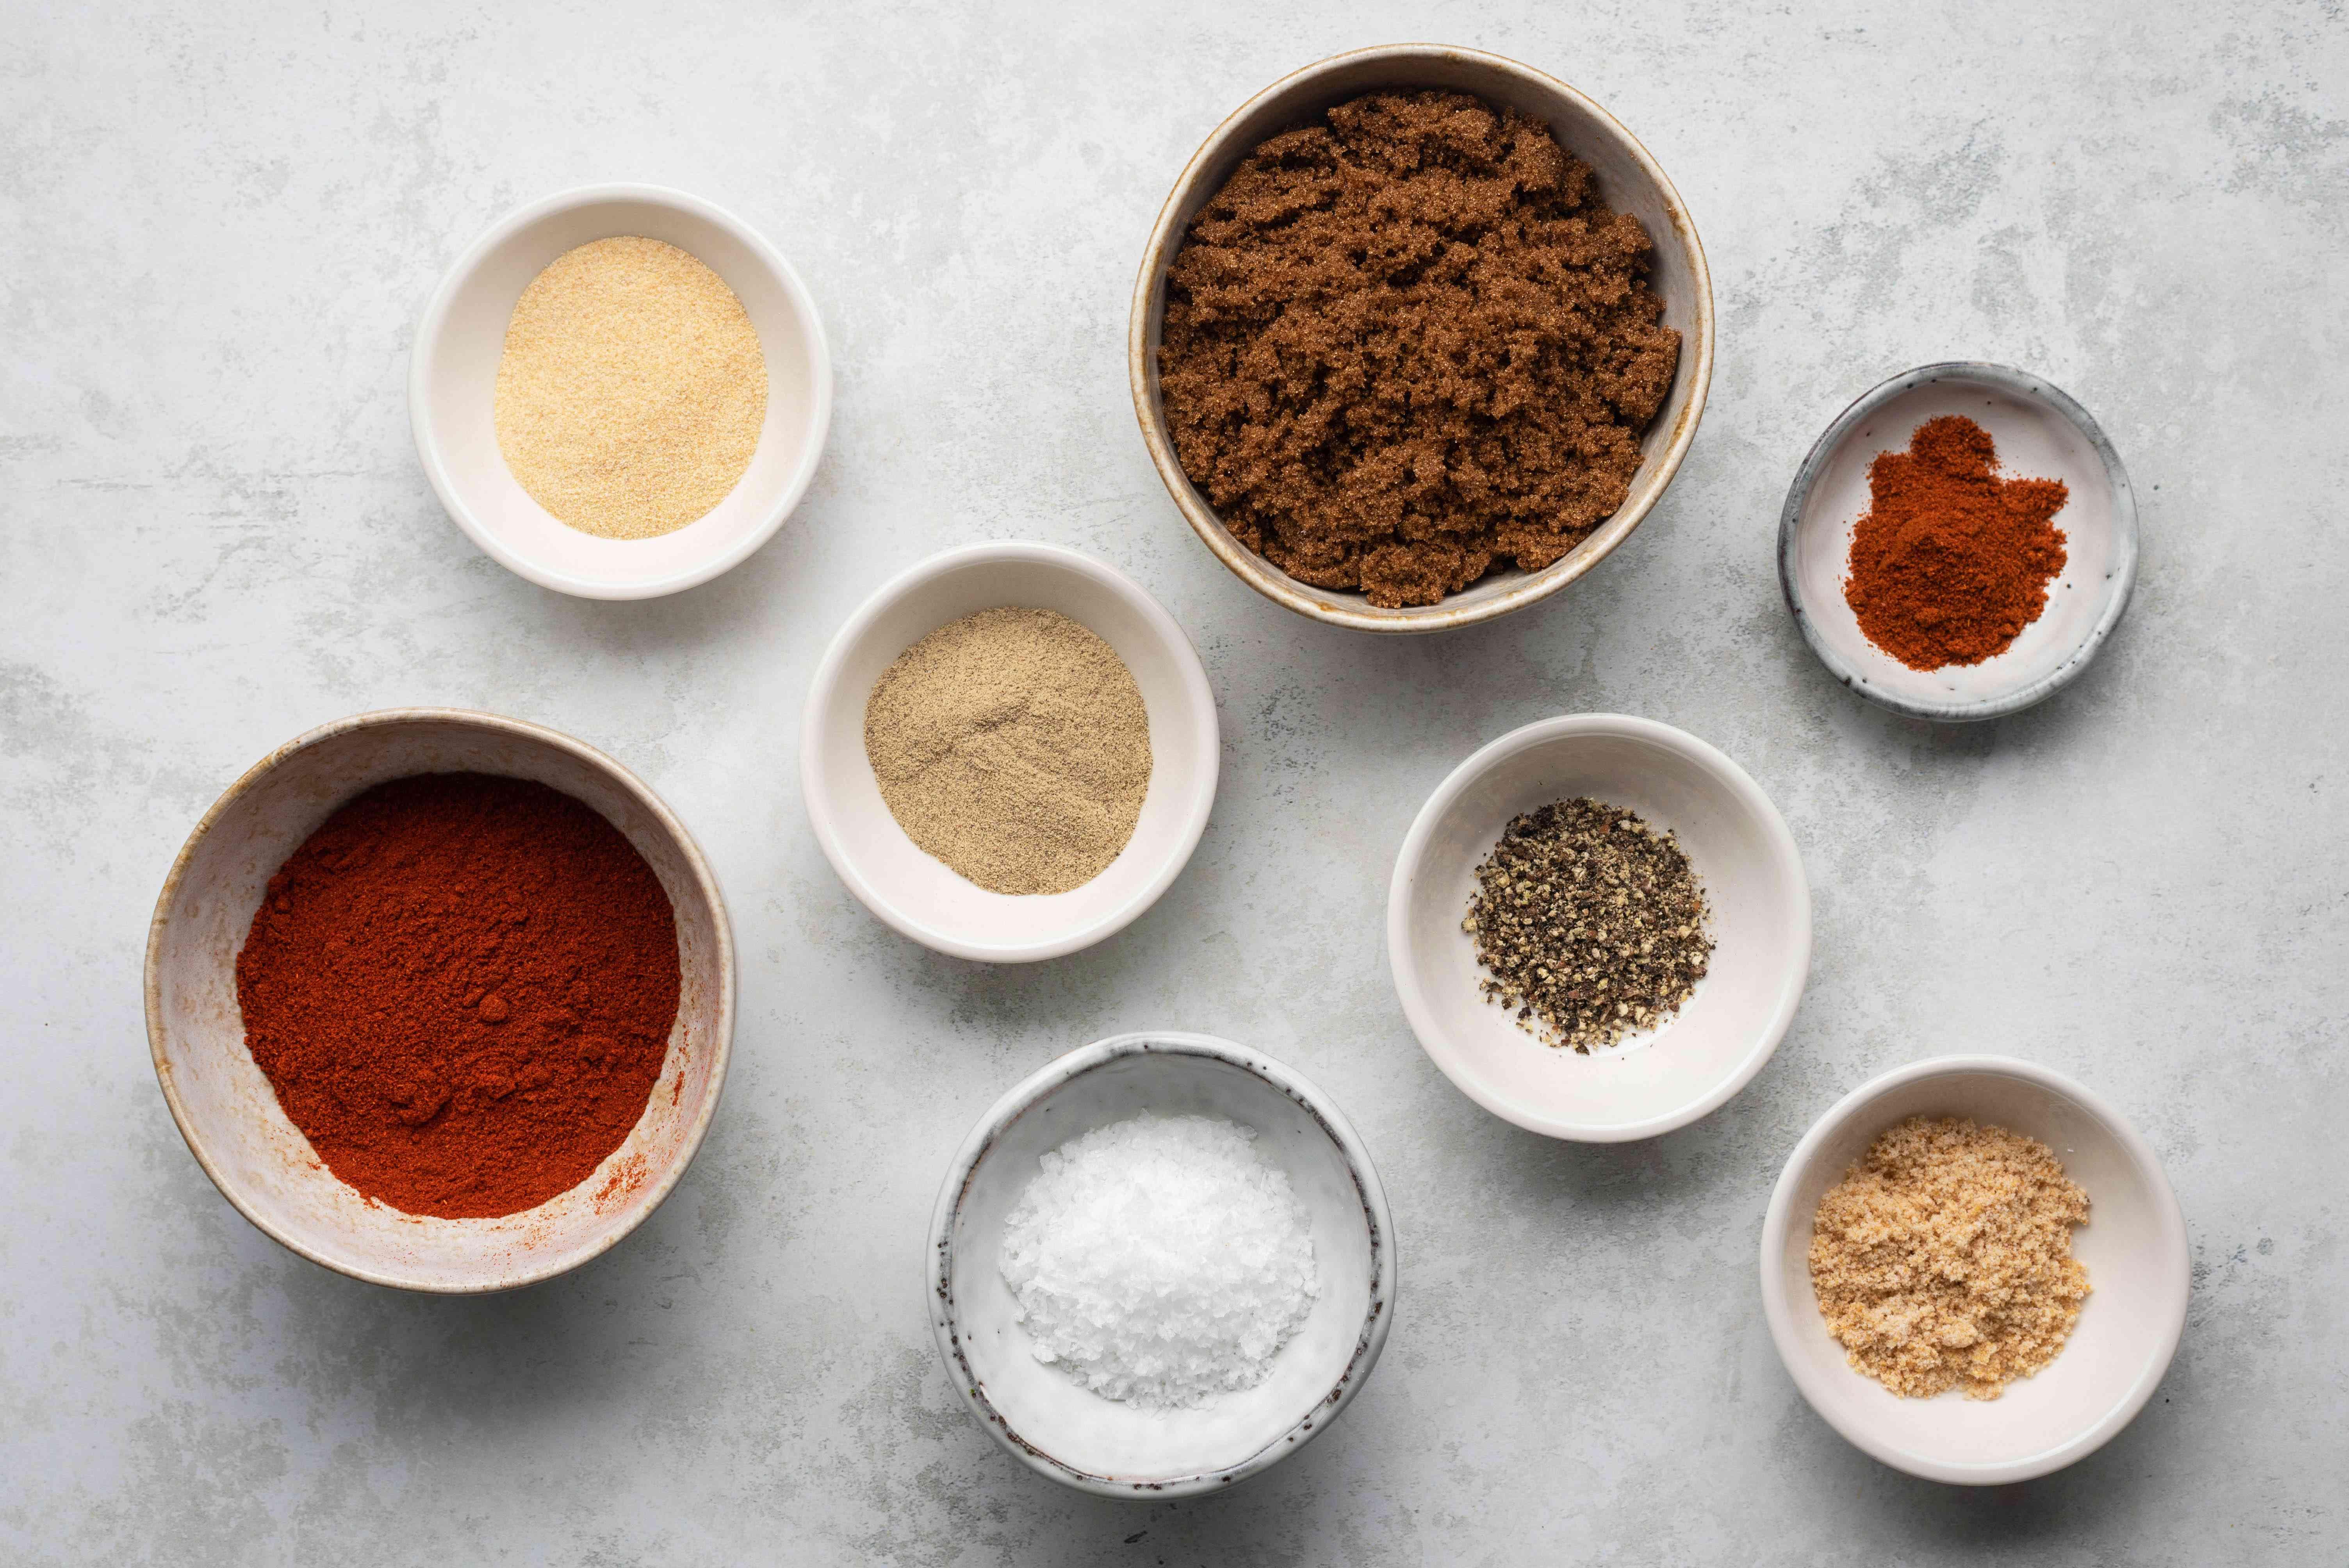 Sparerib Dry Rub ingredients